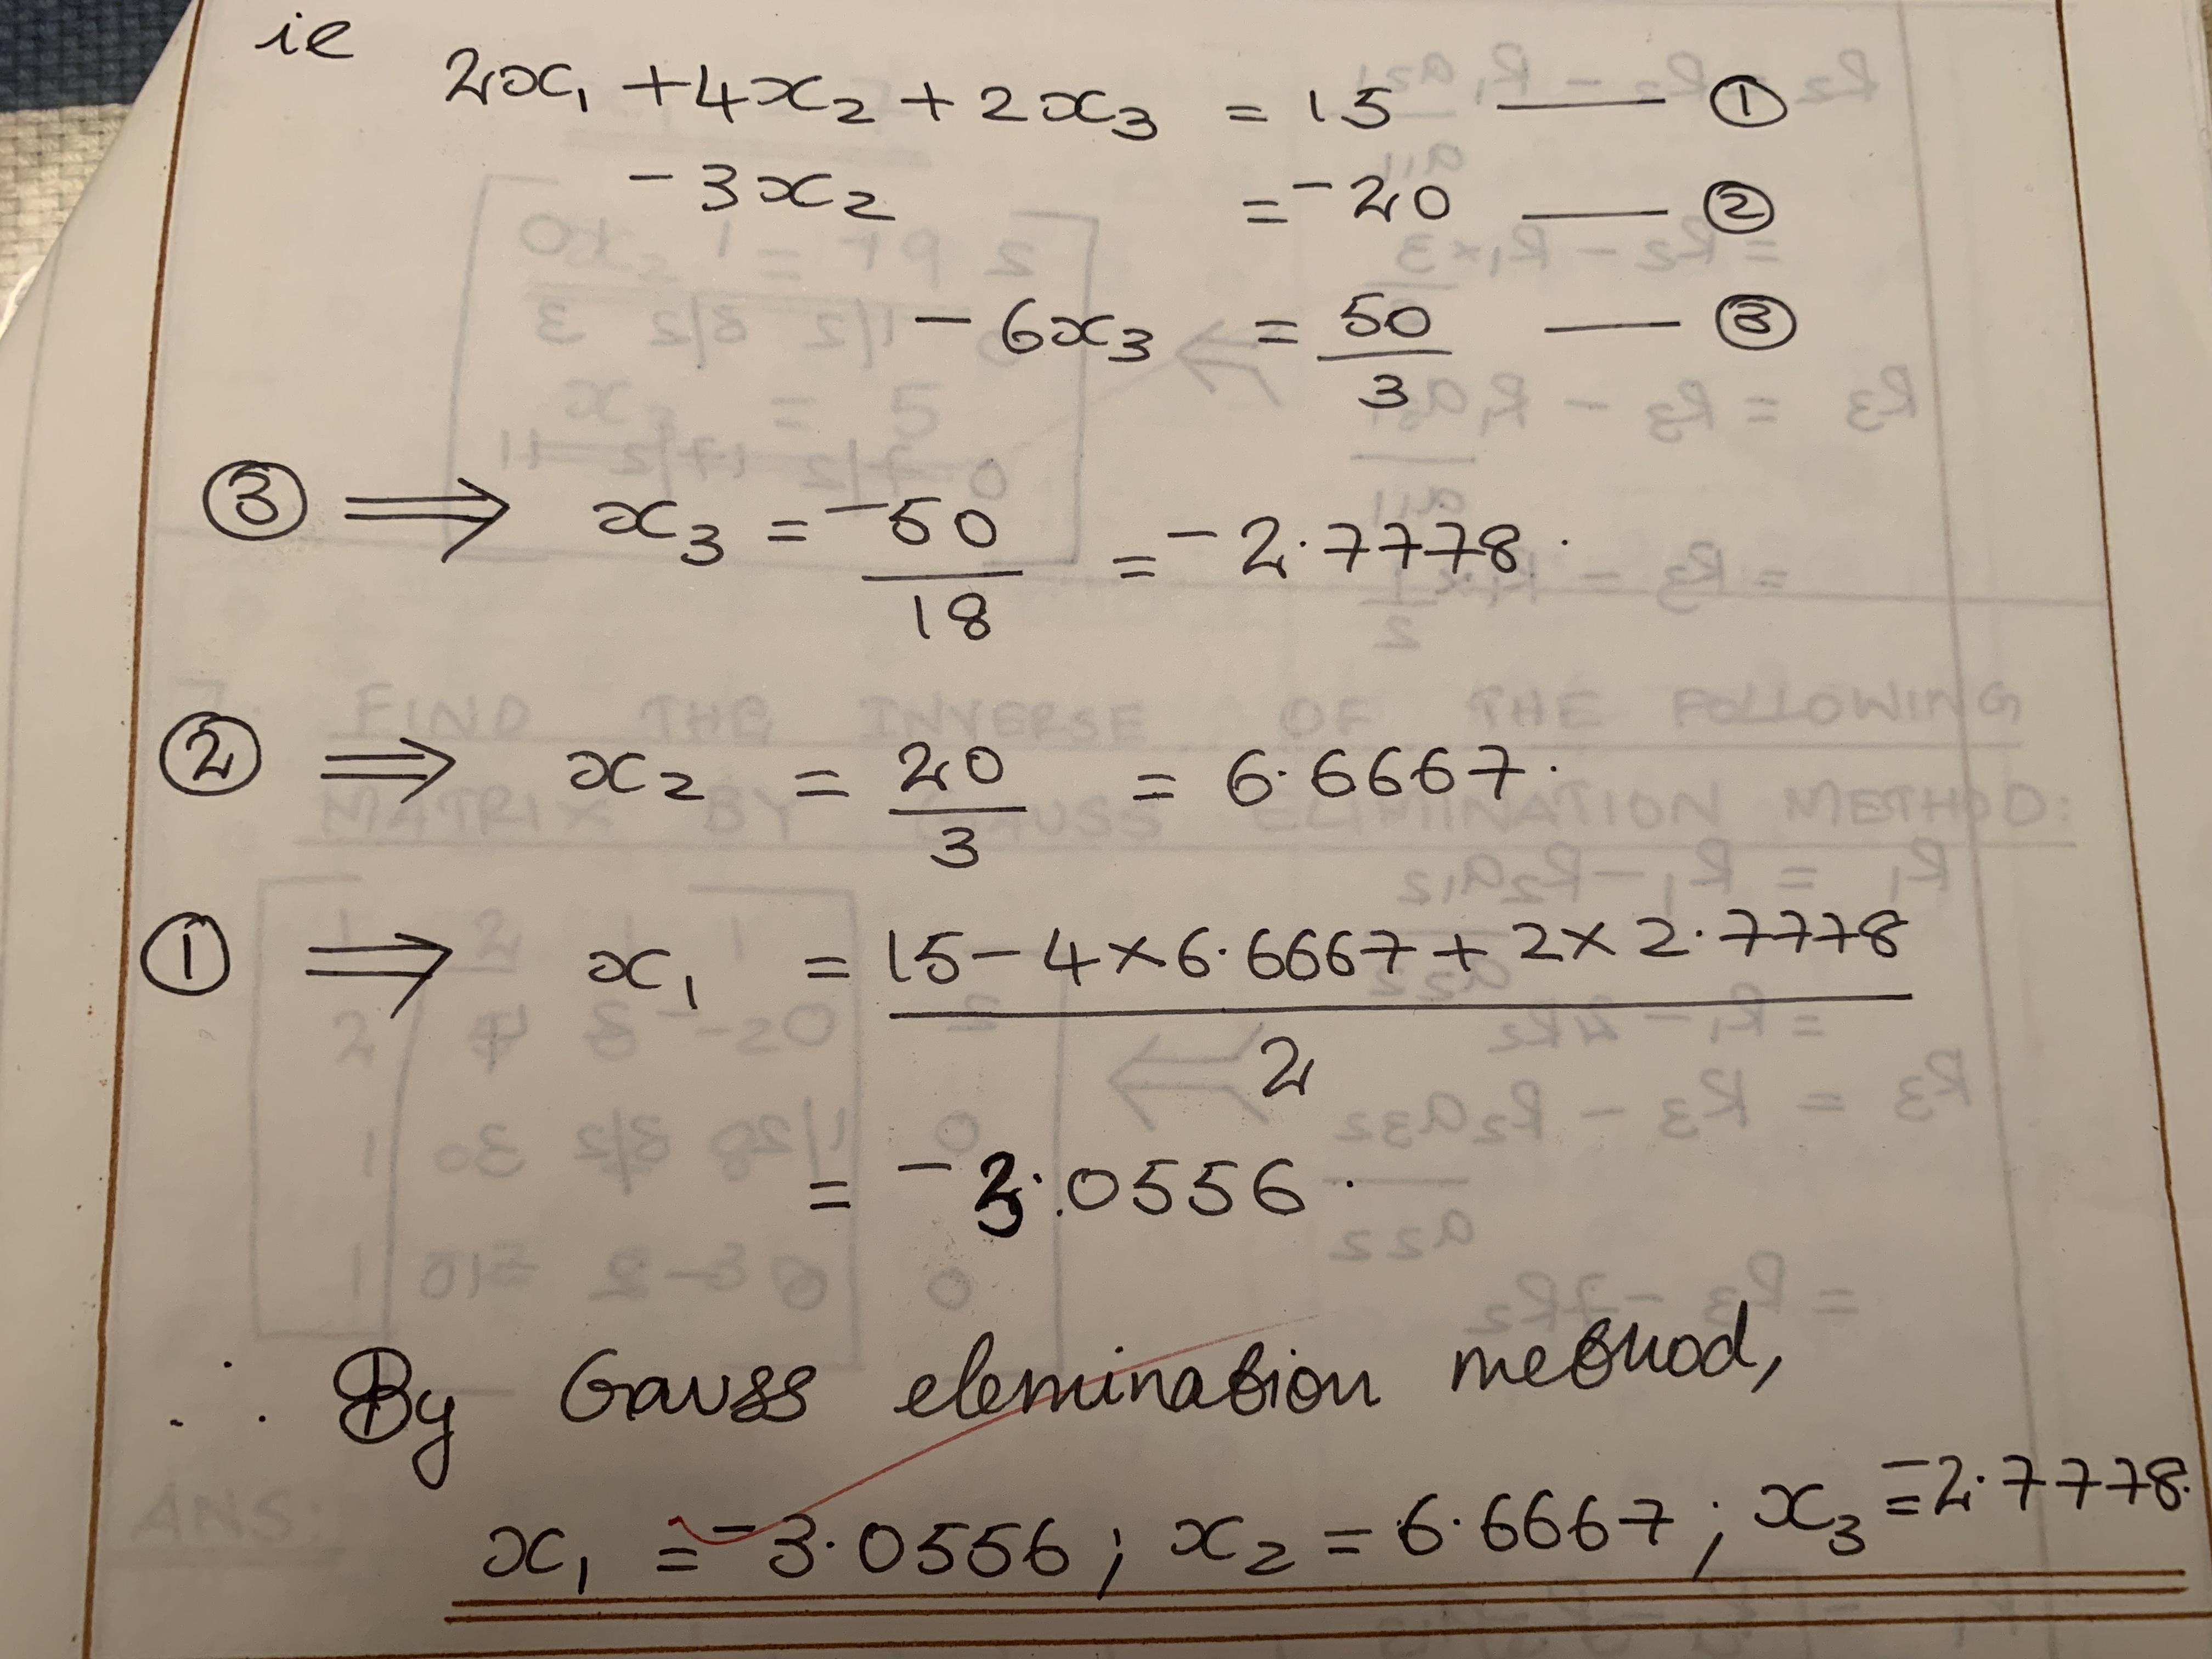 gauss-elimination-method2